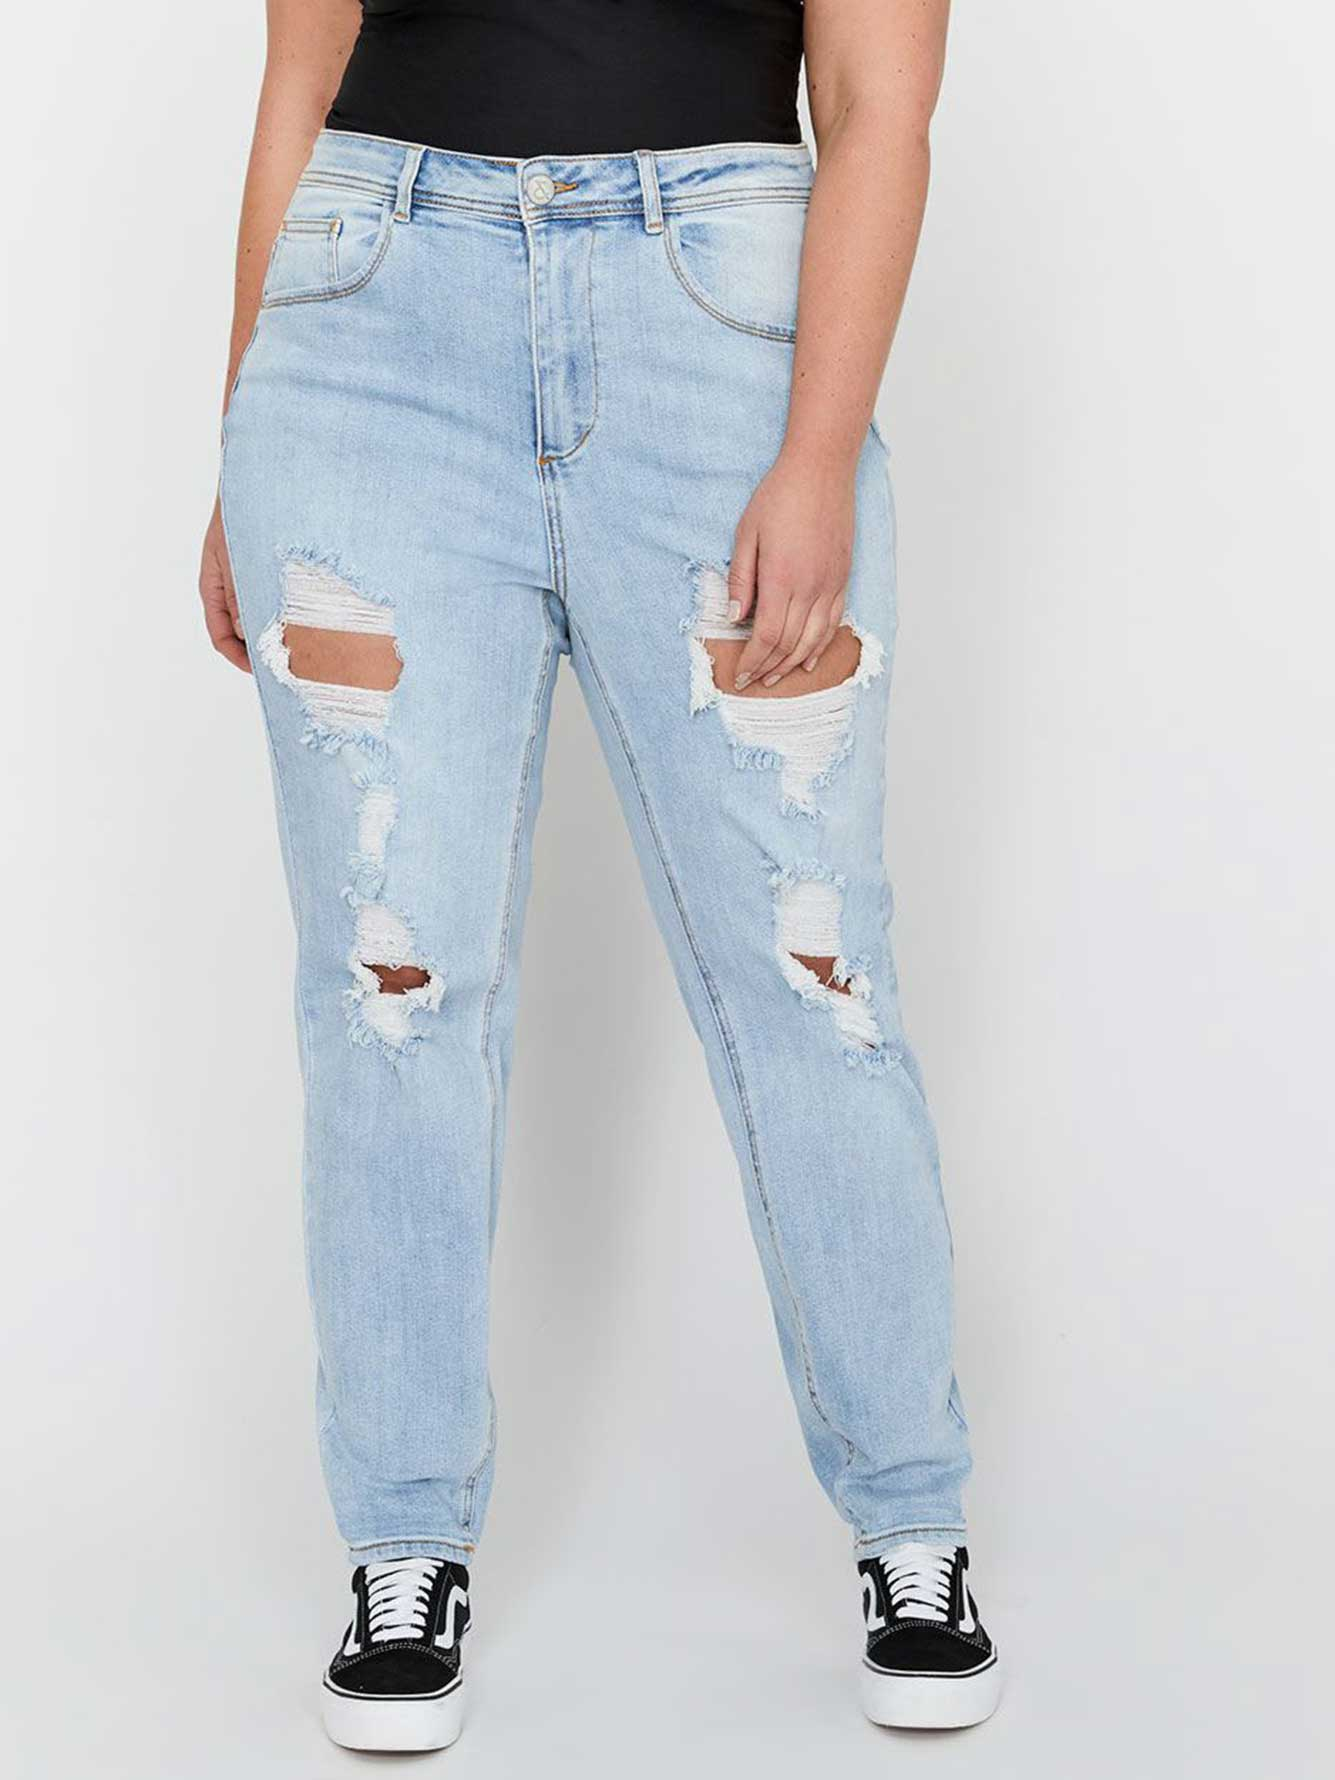 224e07bd L&L X Jordyn Woods Heavy Ripped High Waist Mom Jeans | Addition ...